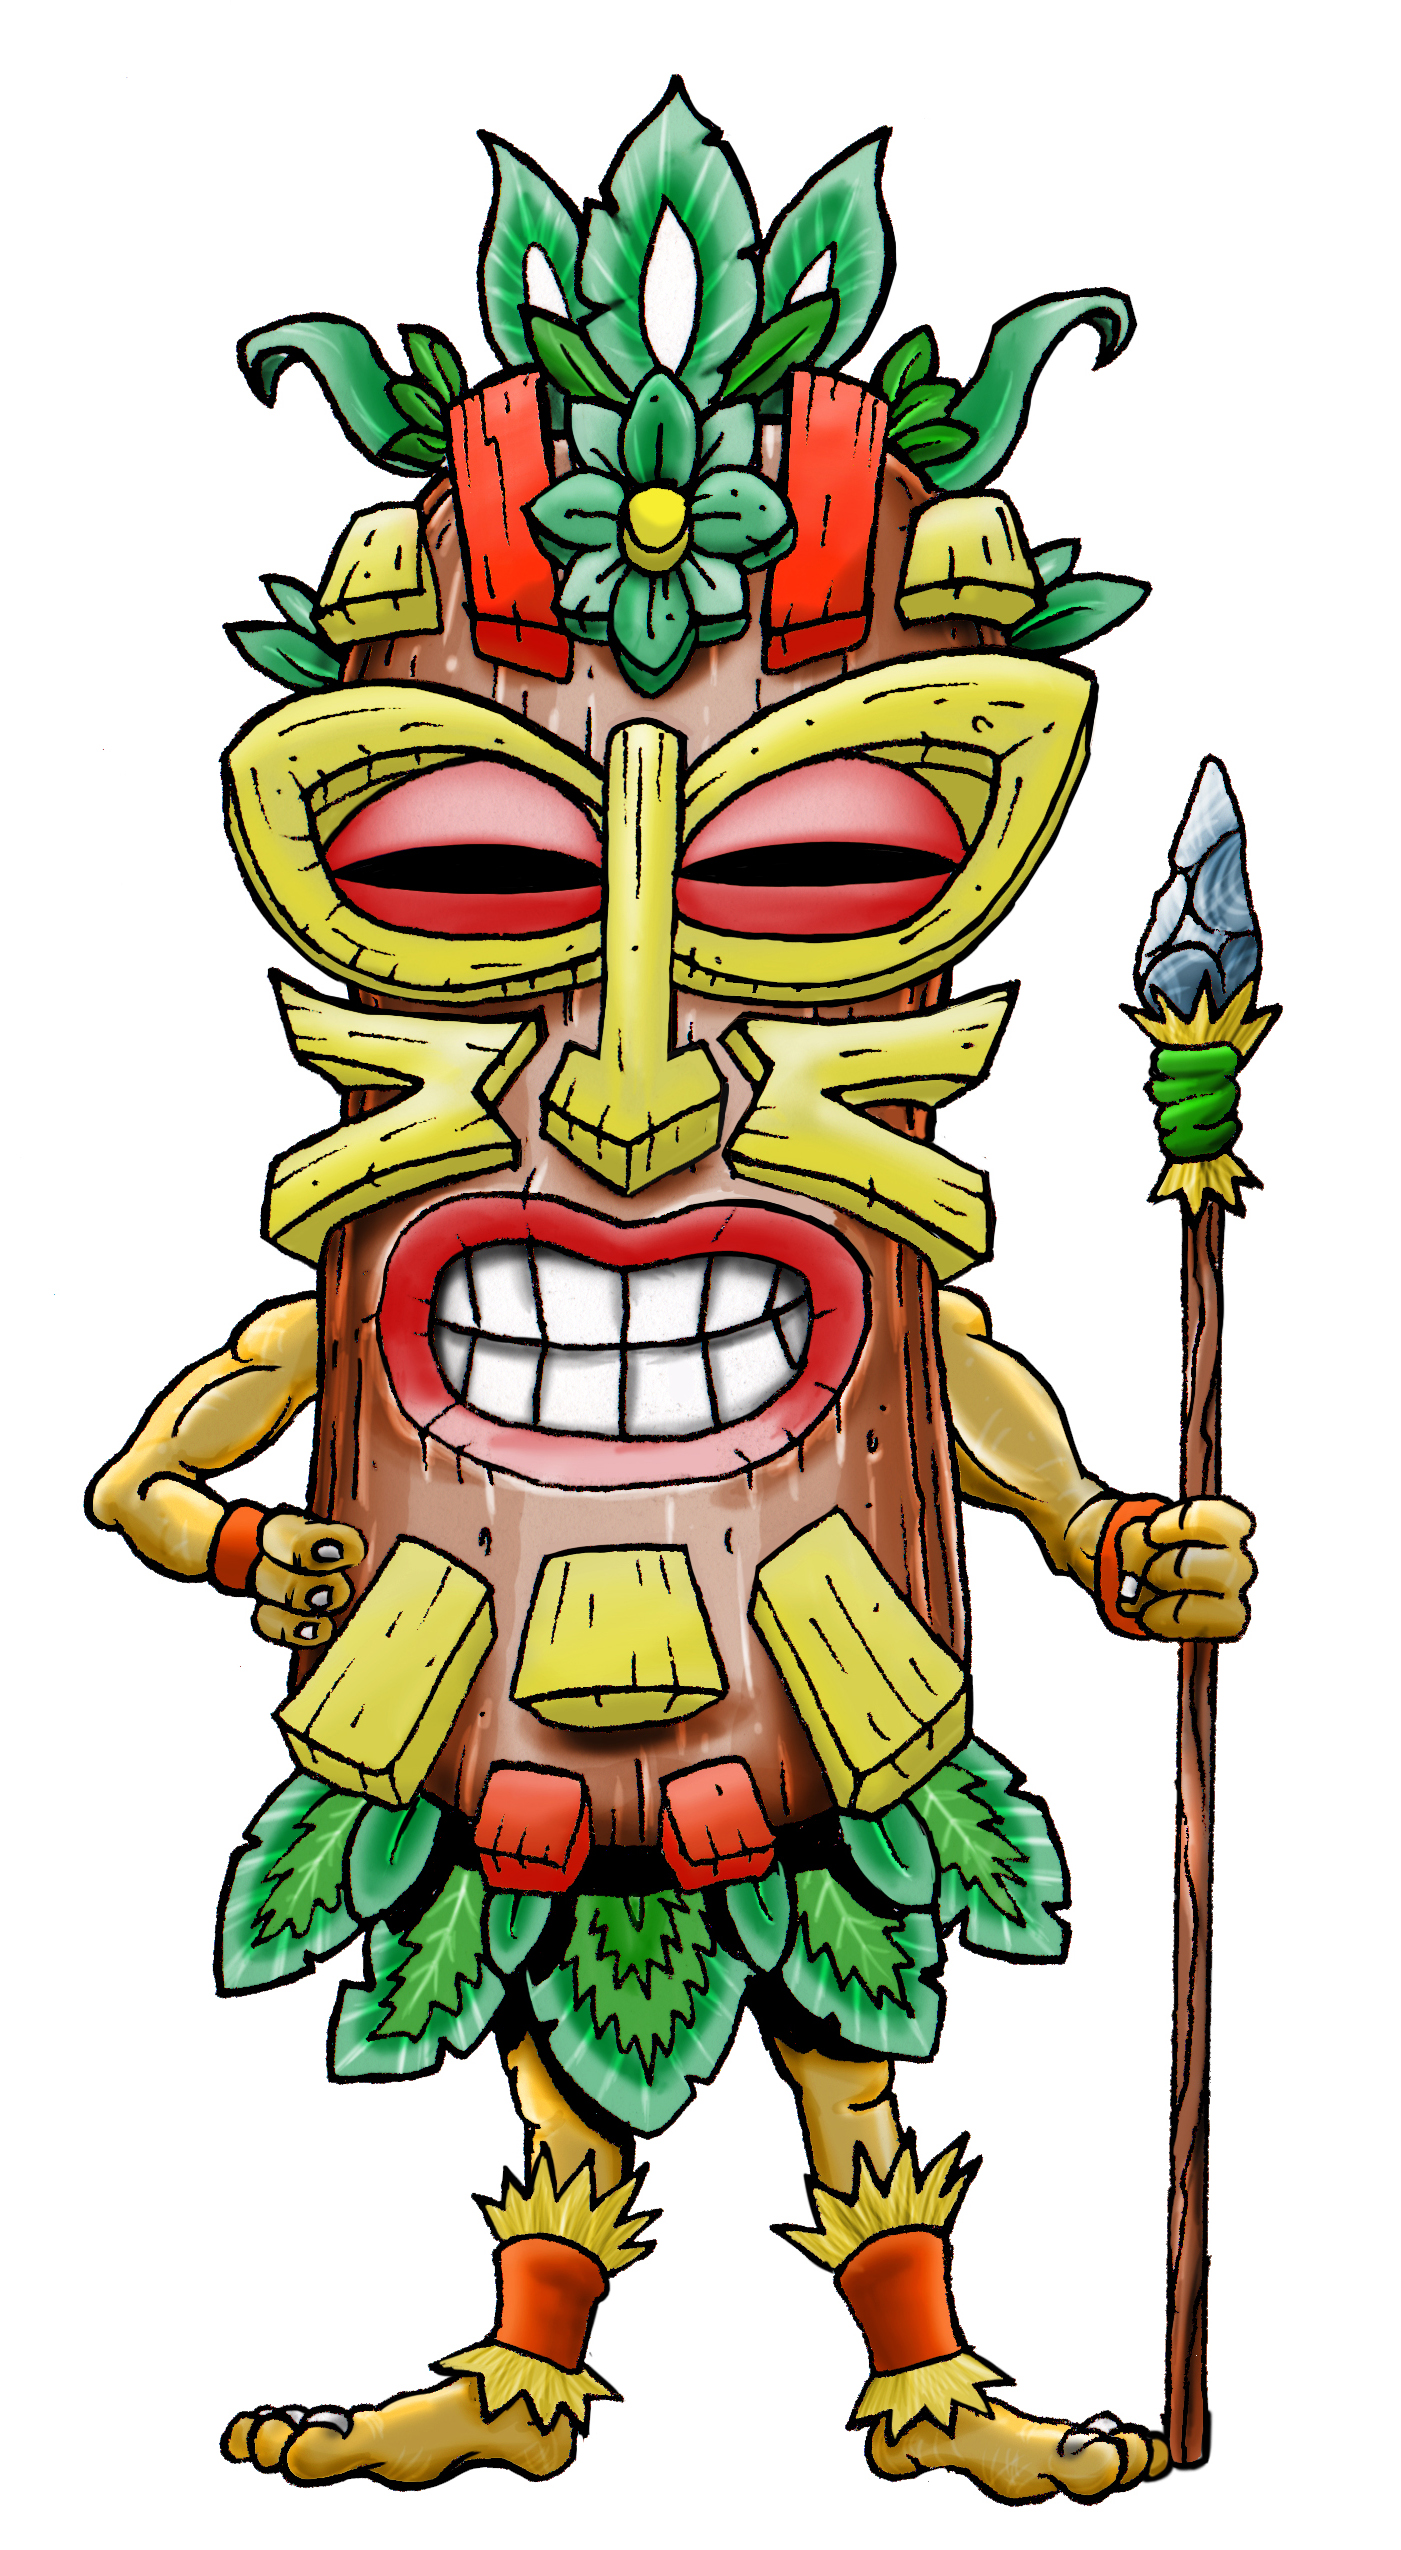 Witiki Character